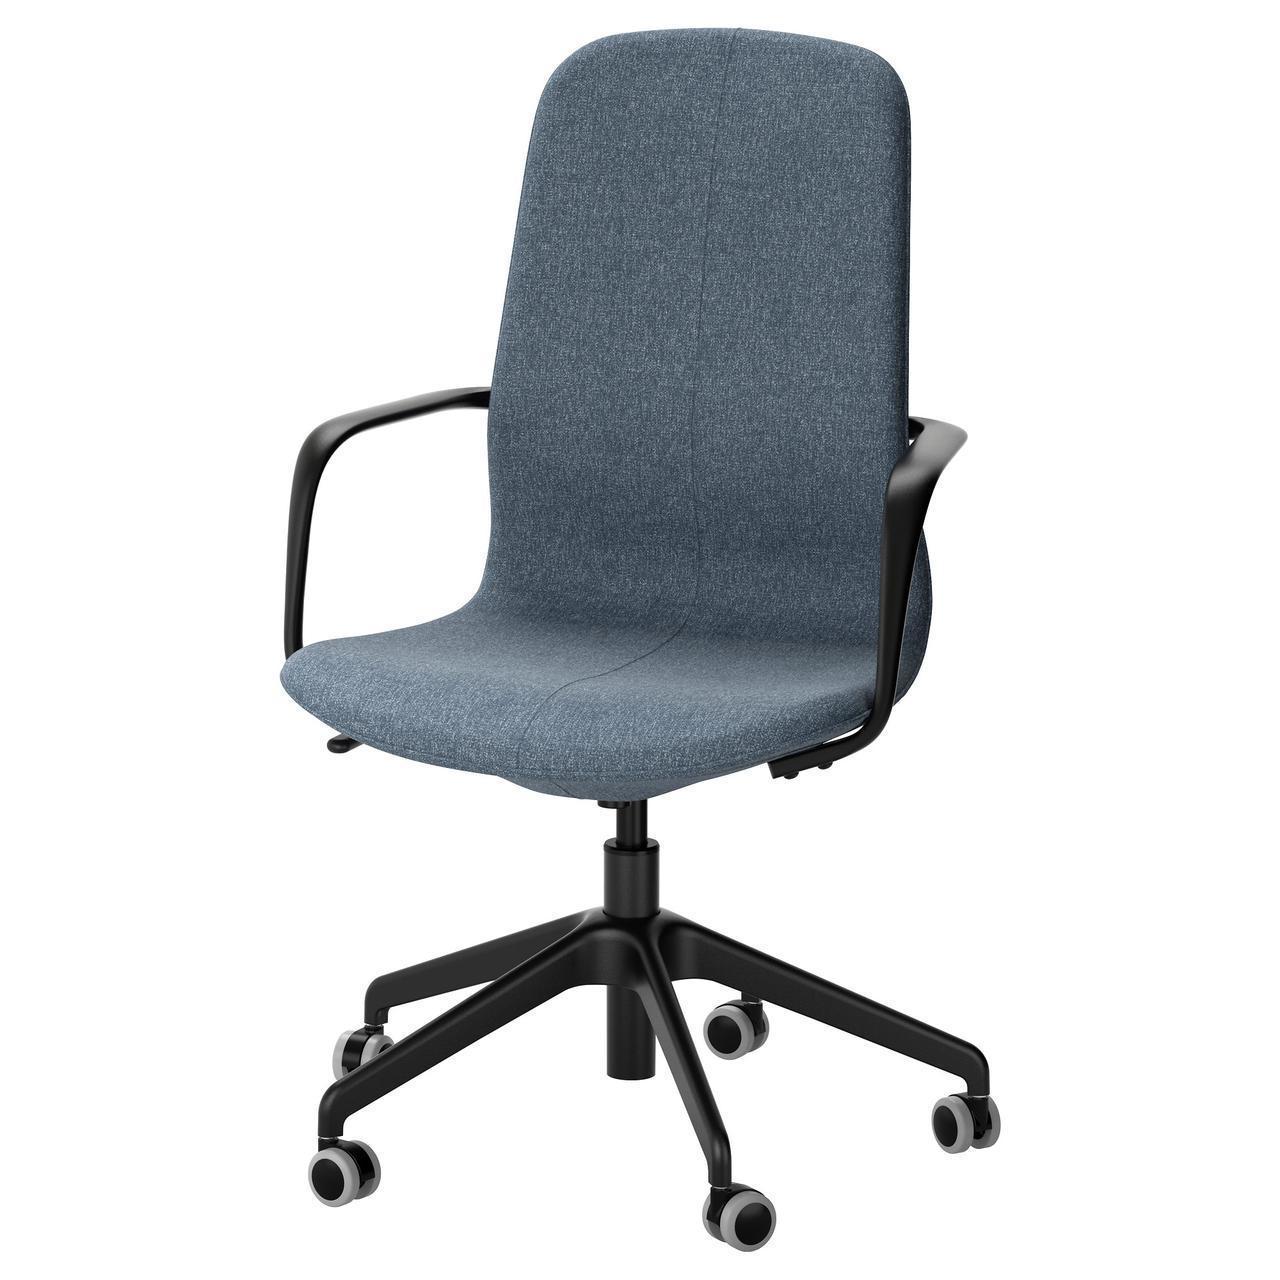 Комп'ютерне крісло IKEA LÅNGFJÄLL Gunnared блакитне чорне 591.780.77